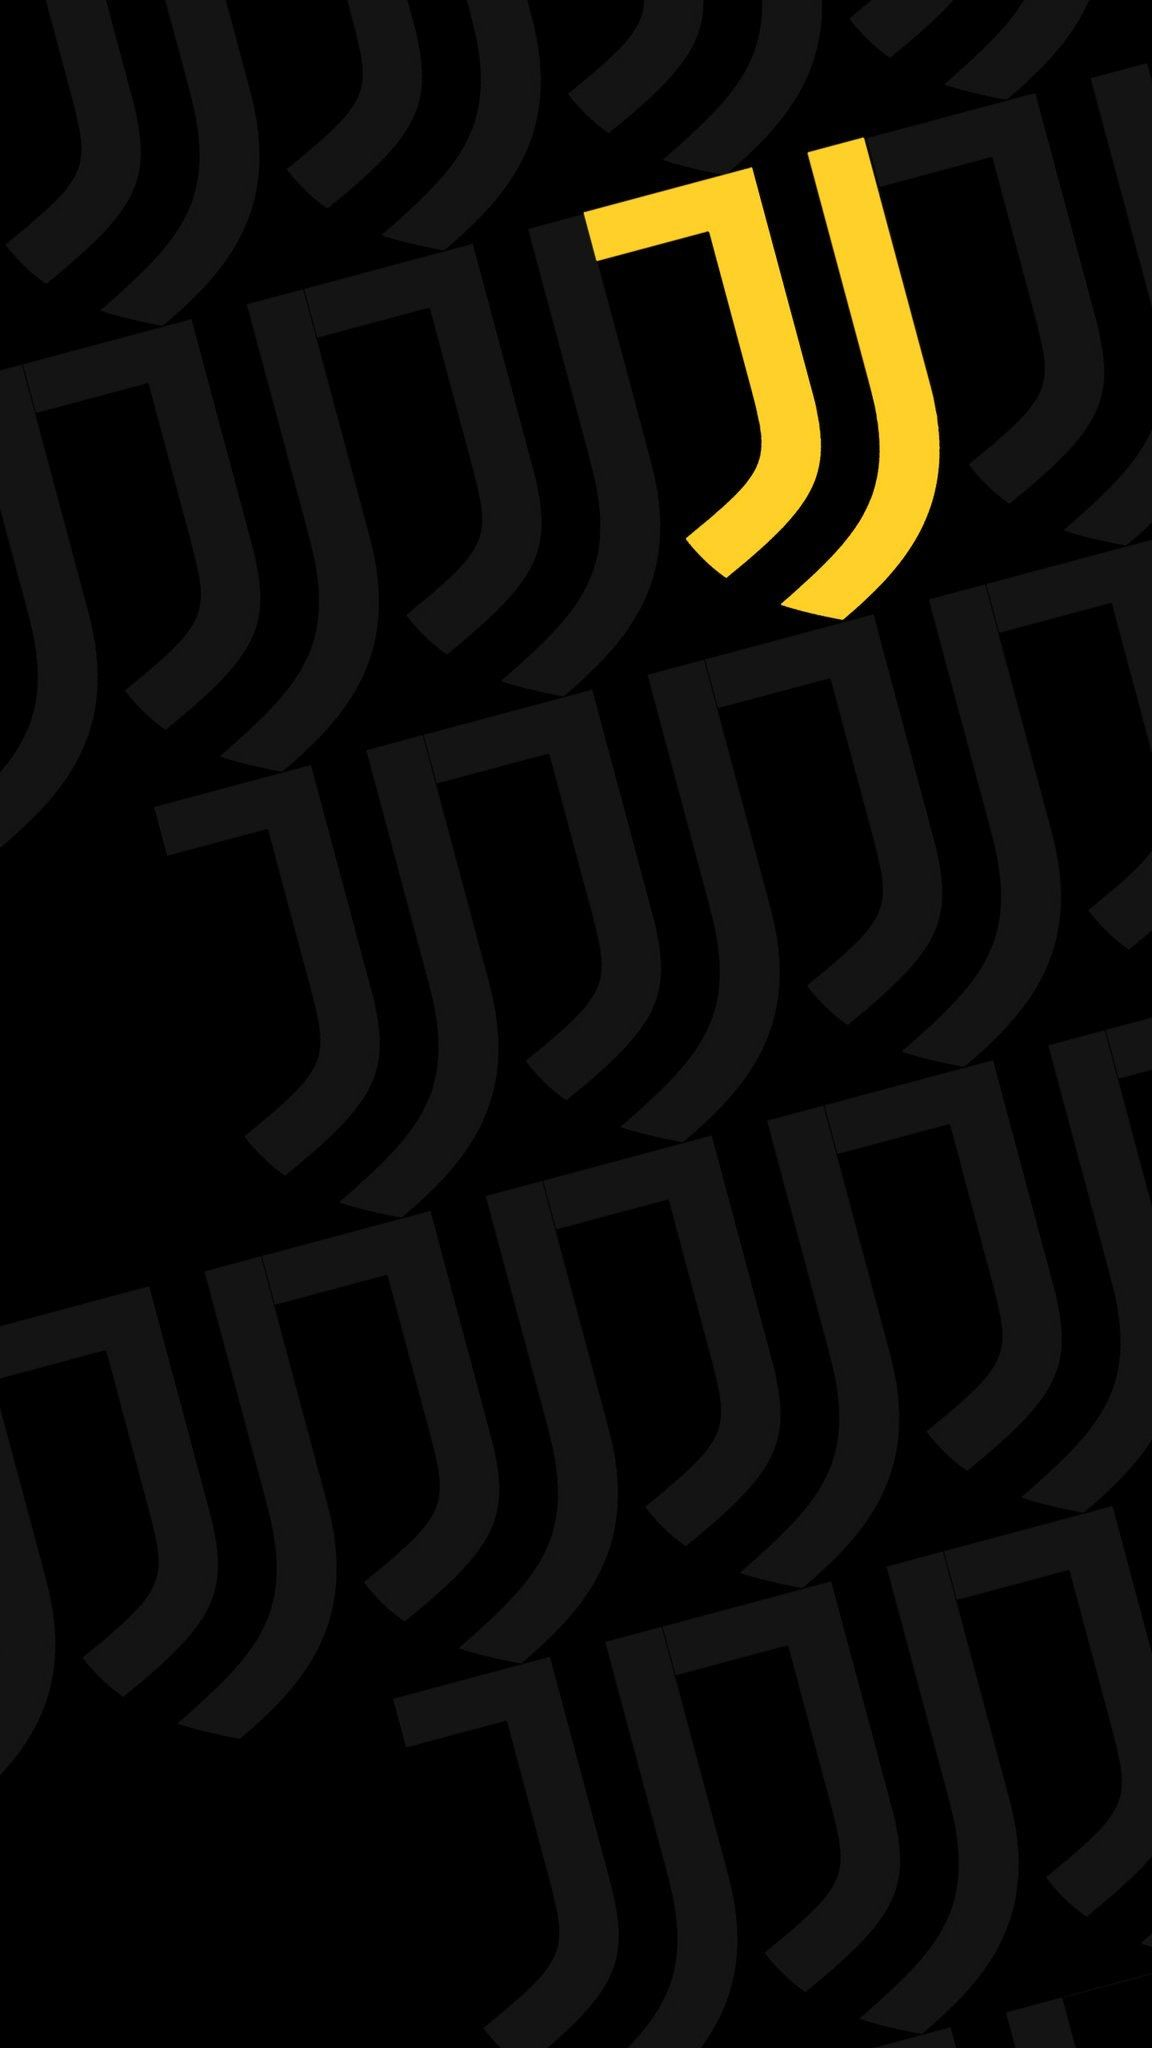 Juventus Wallpaper Hd Iphone Floweryred2com